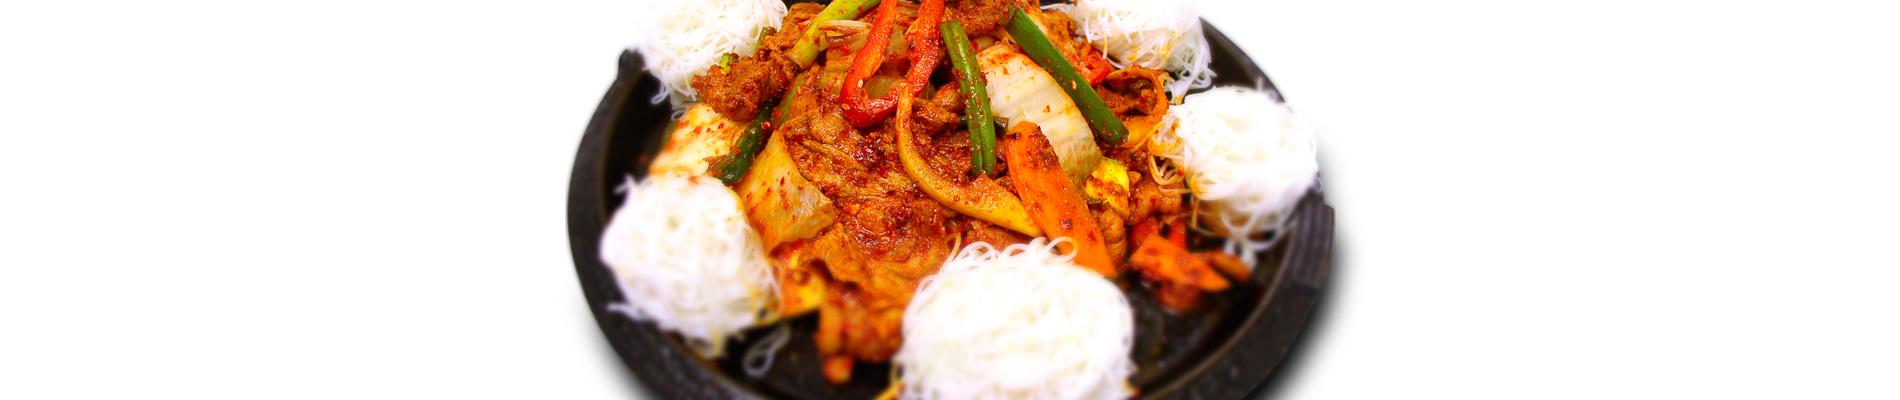 Stir-fried Sliced Pork & Kimchi